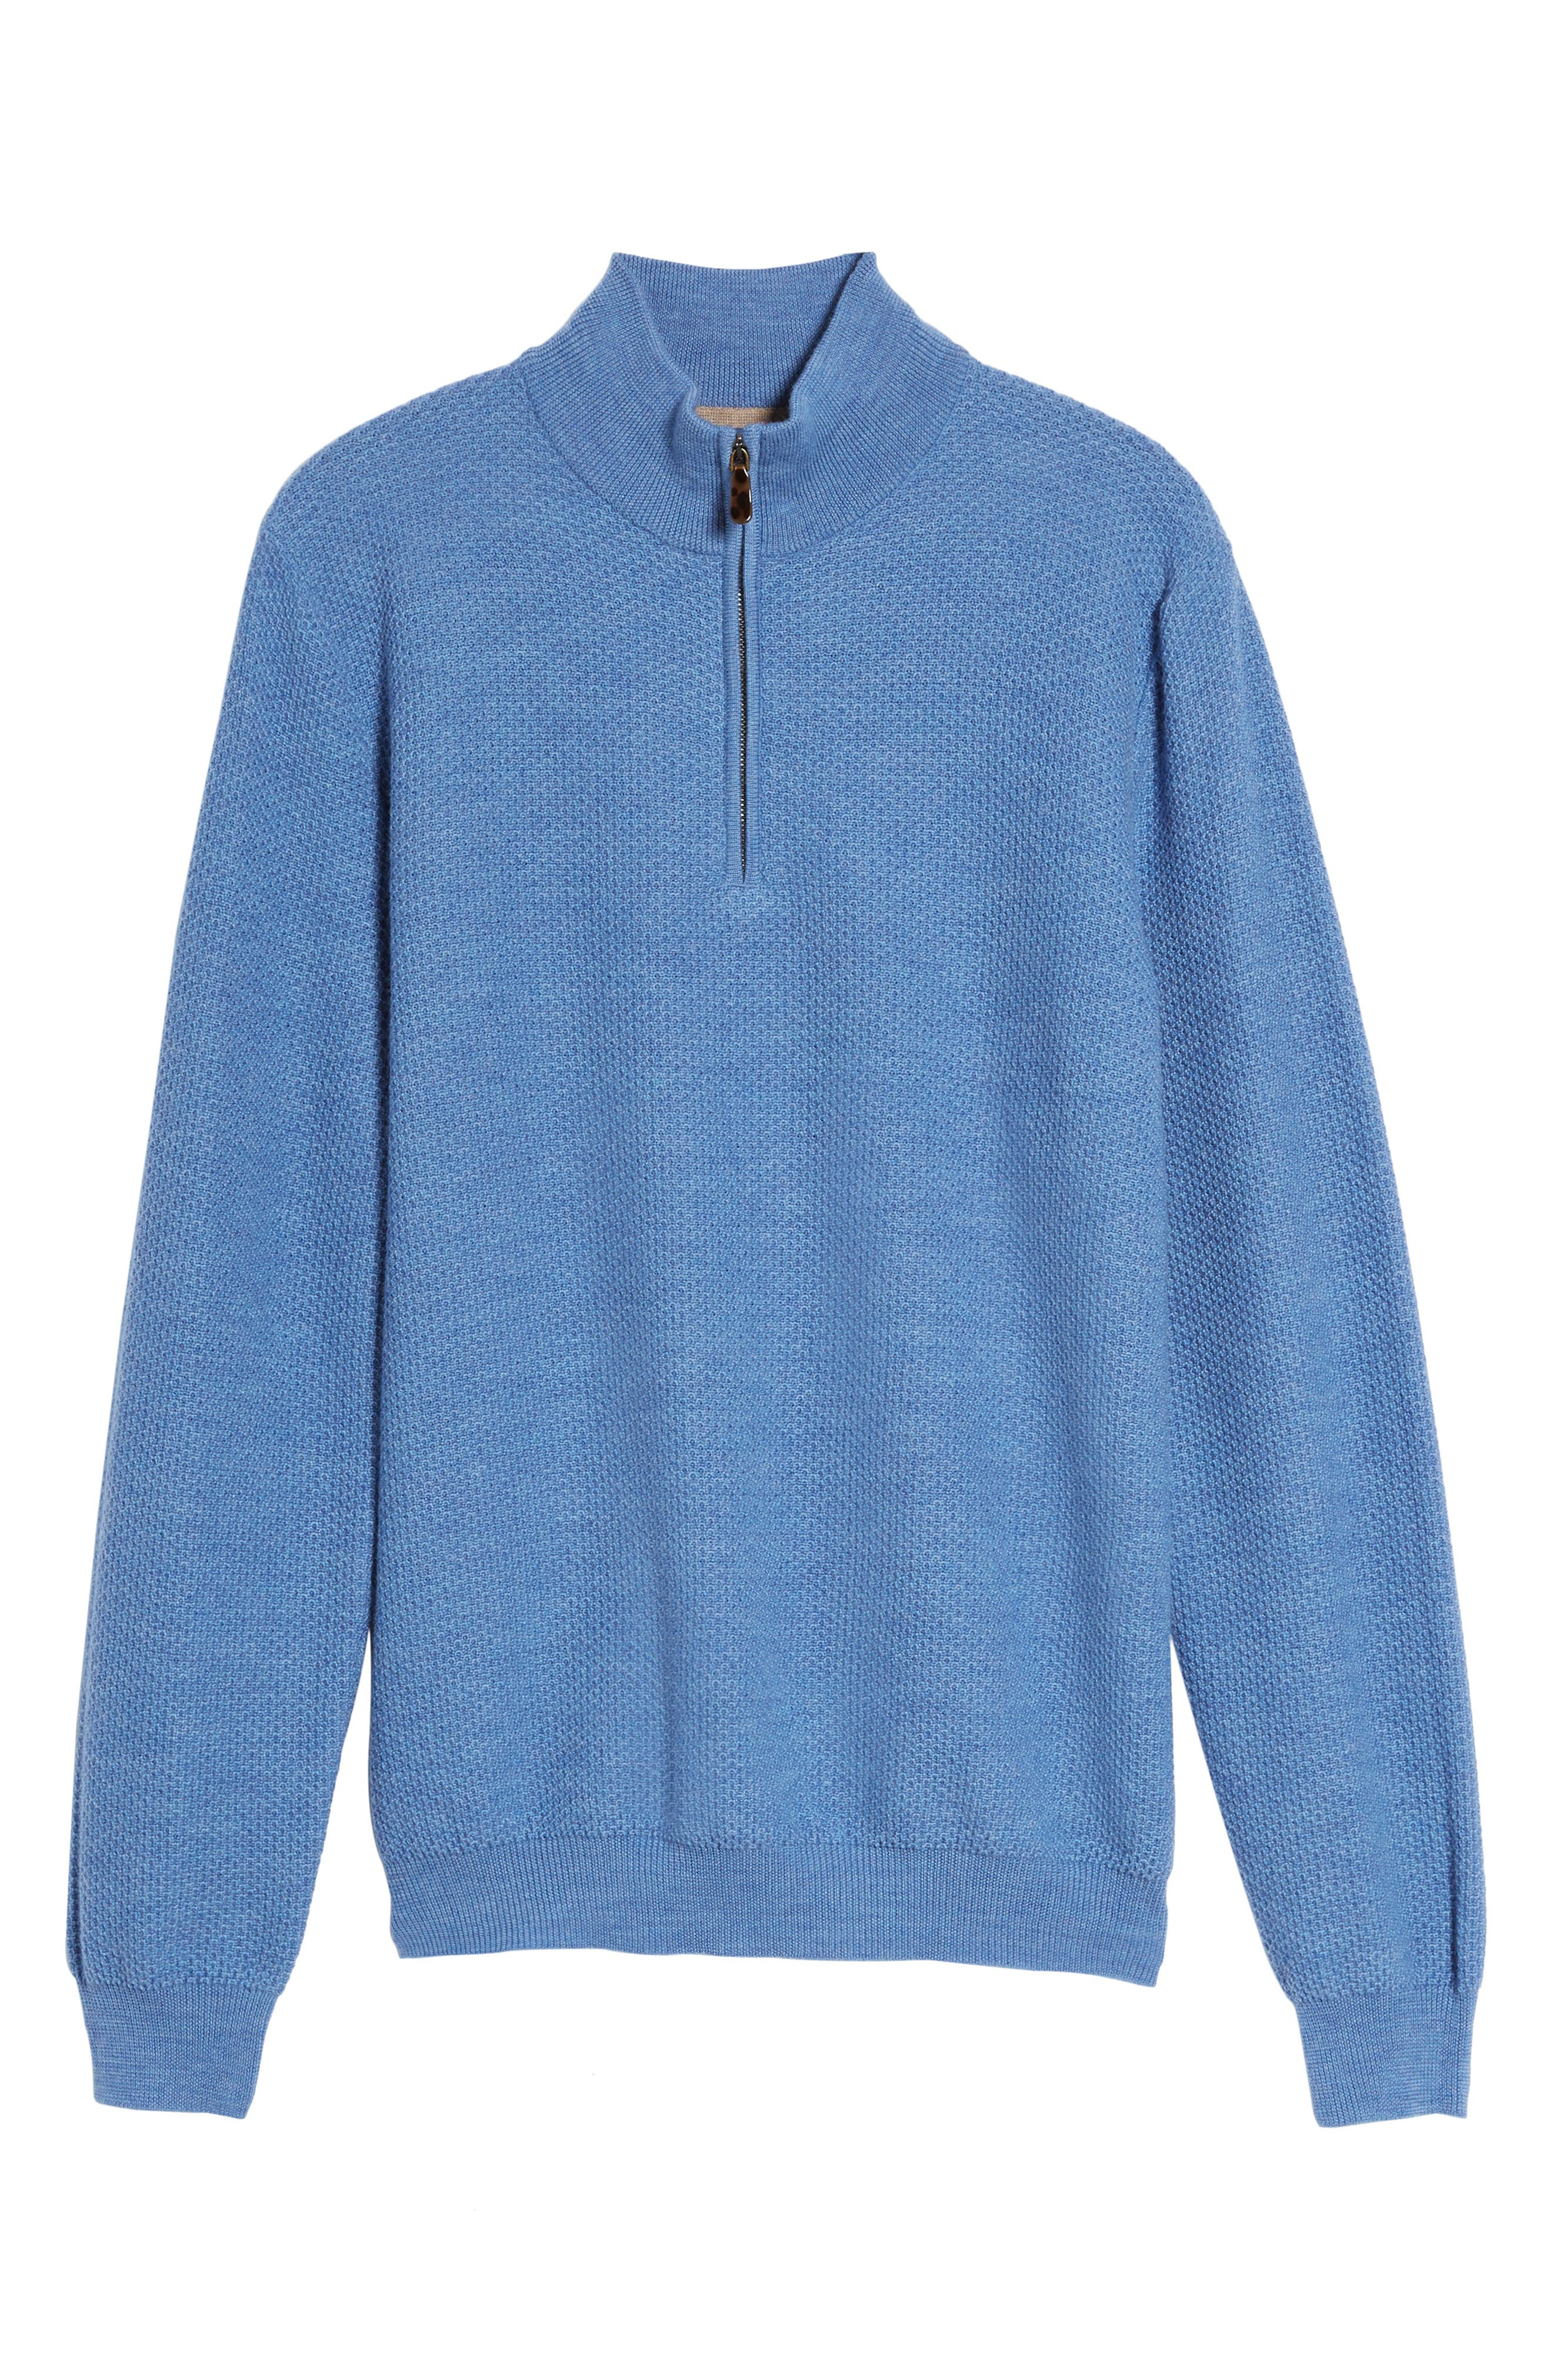 Honeycomb Merino Wool Quarter Zip Pullover,                             Alternate thumbnail 17, color,